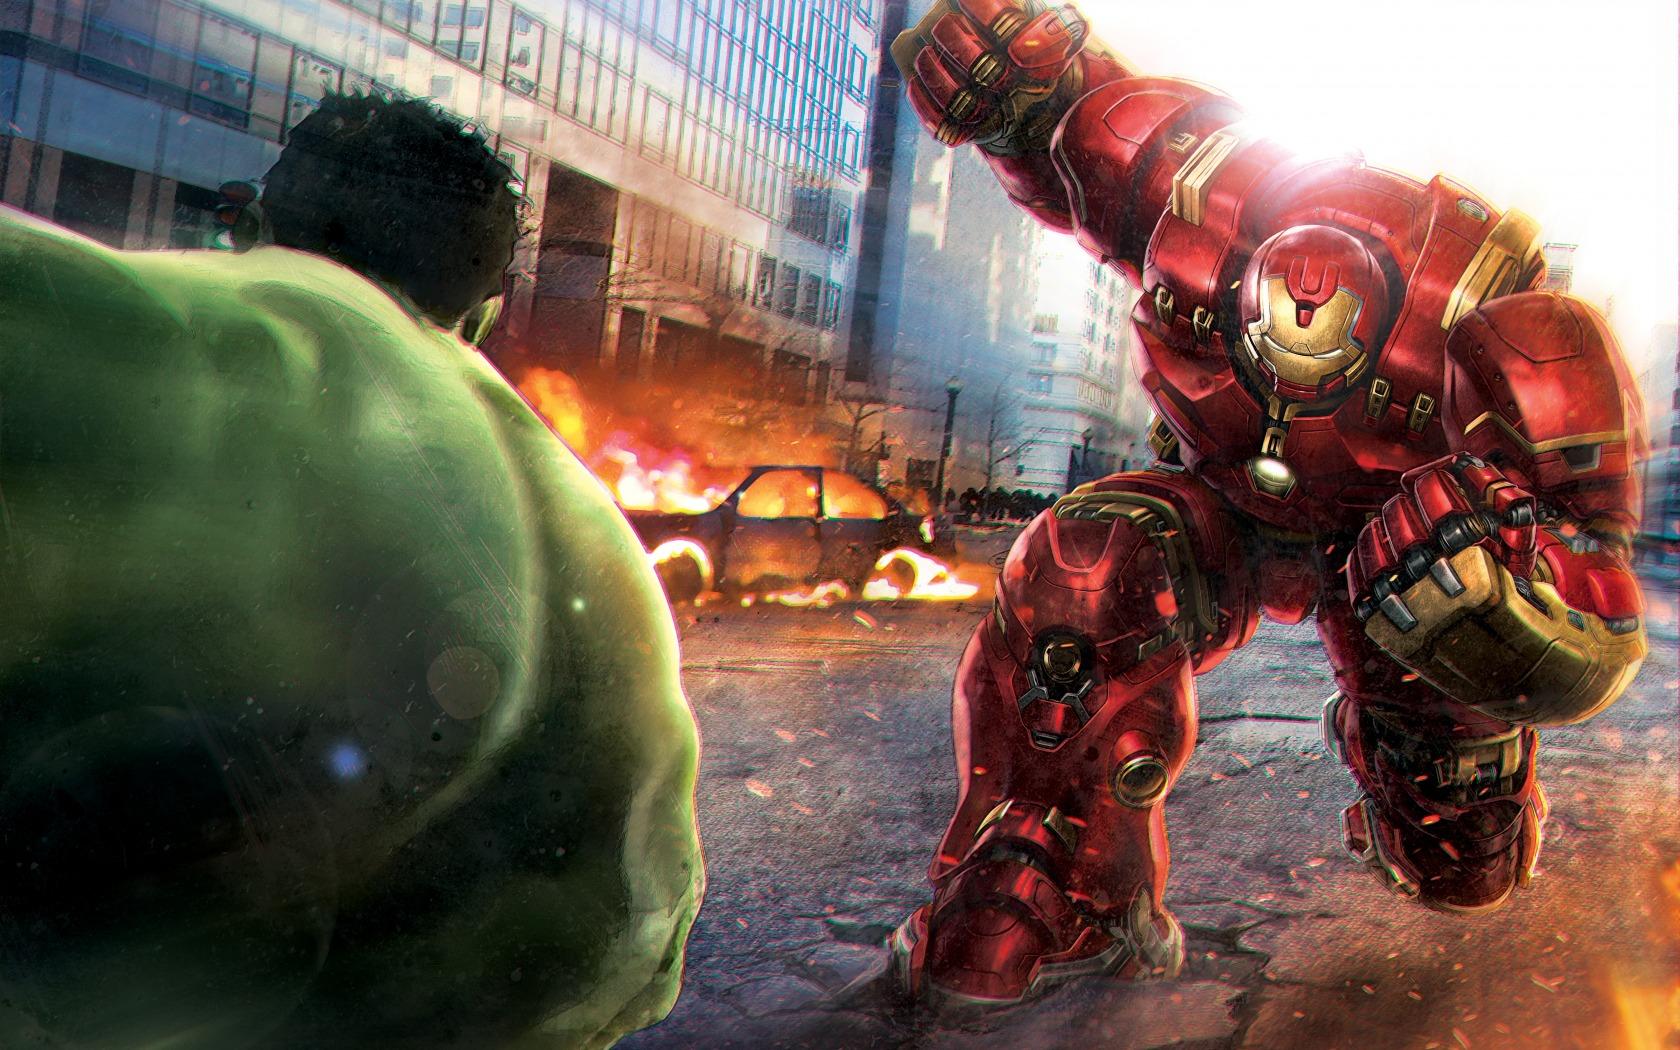 Iron Man Hulk Comics Games Screenshot Computer Wallpaper Special Effects Pc Game Avengers Age Of Ultron